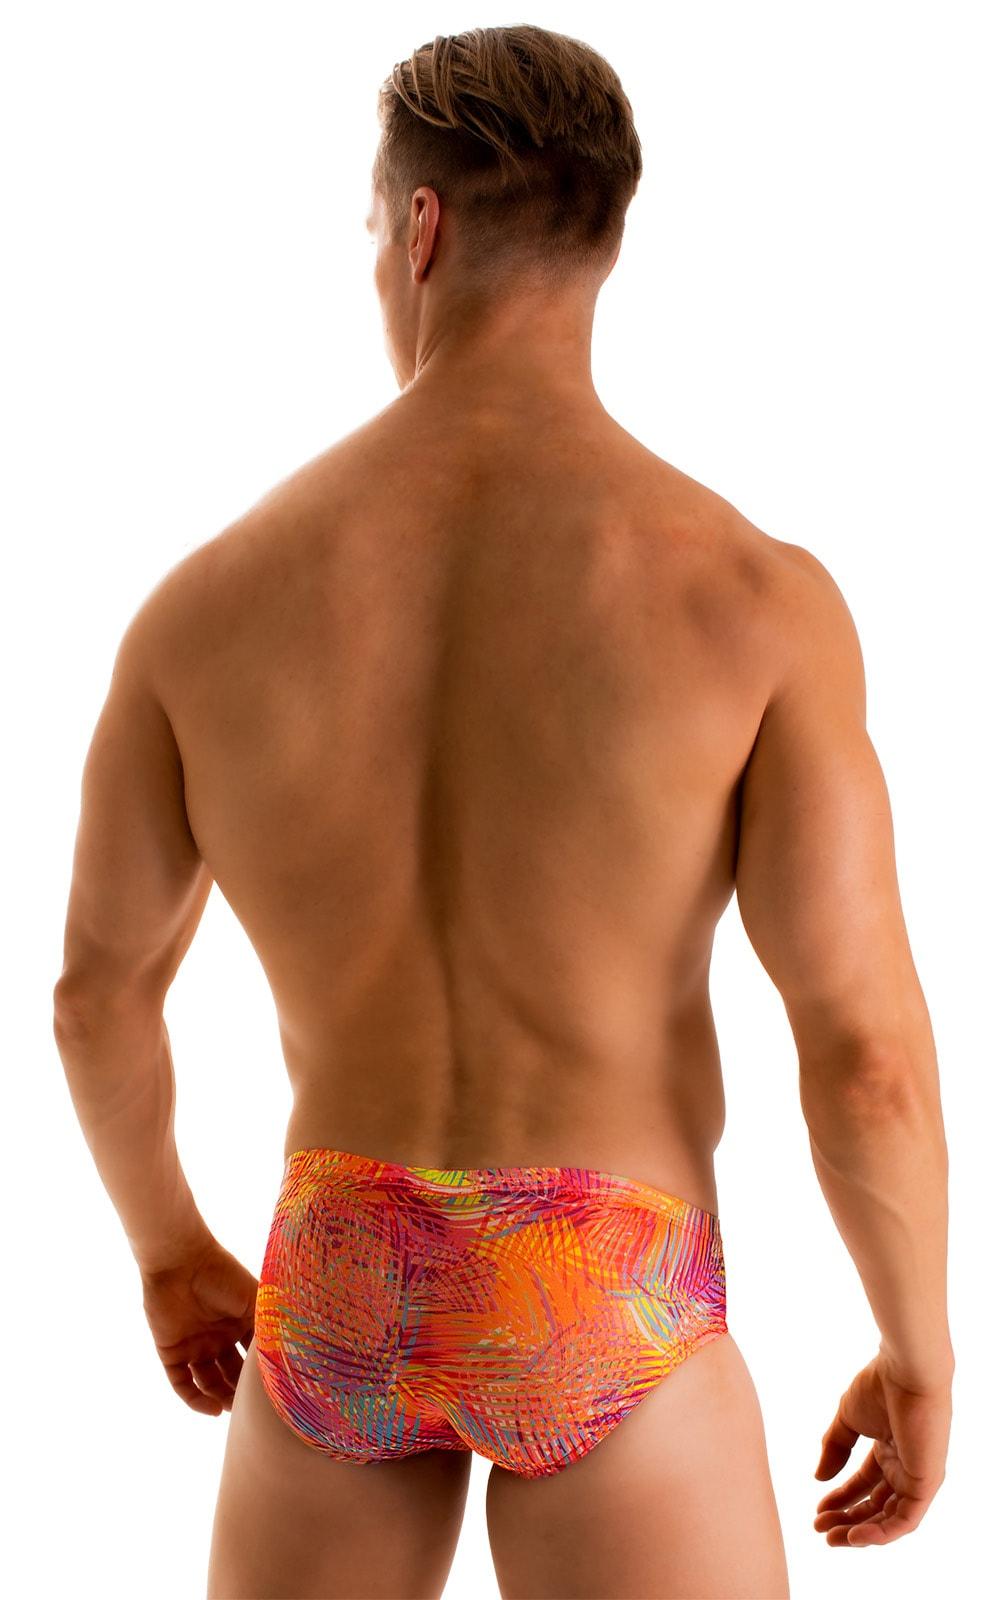 Pouch Brief Swimsuit in Tan Through Orange Jungle 2